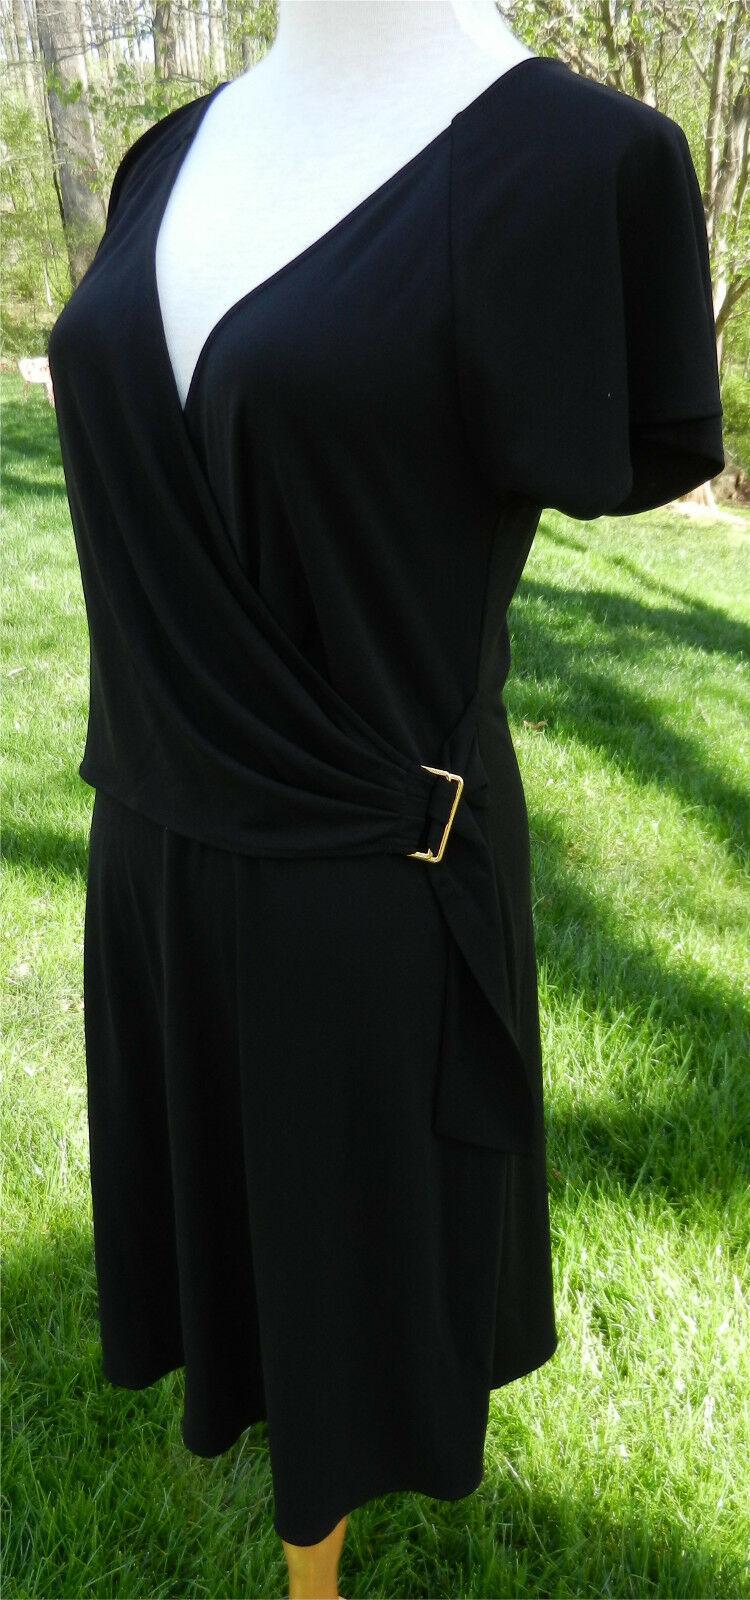 BCBG MAX AZRIA Black SS Faux Wrap Dress Slinky VNeck Gold Buckle at Waist M NWOT